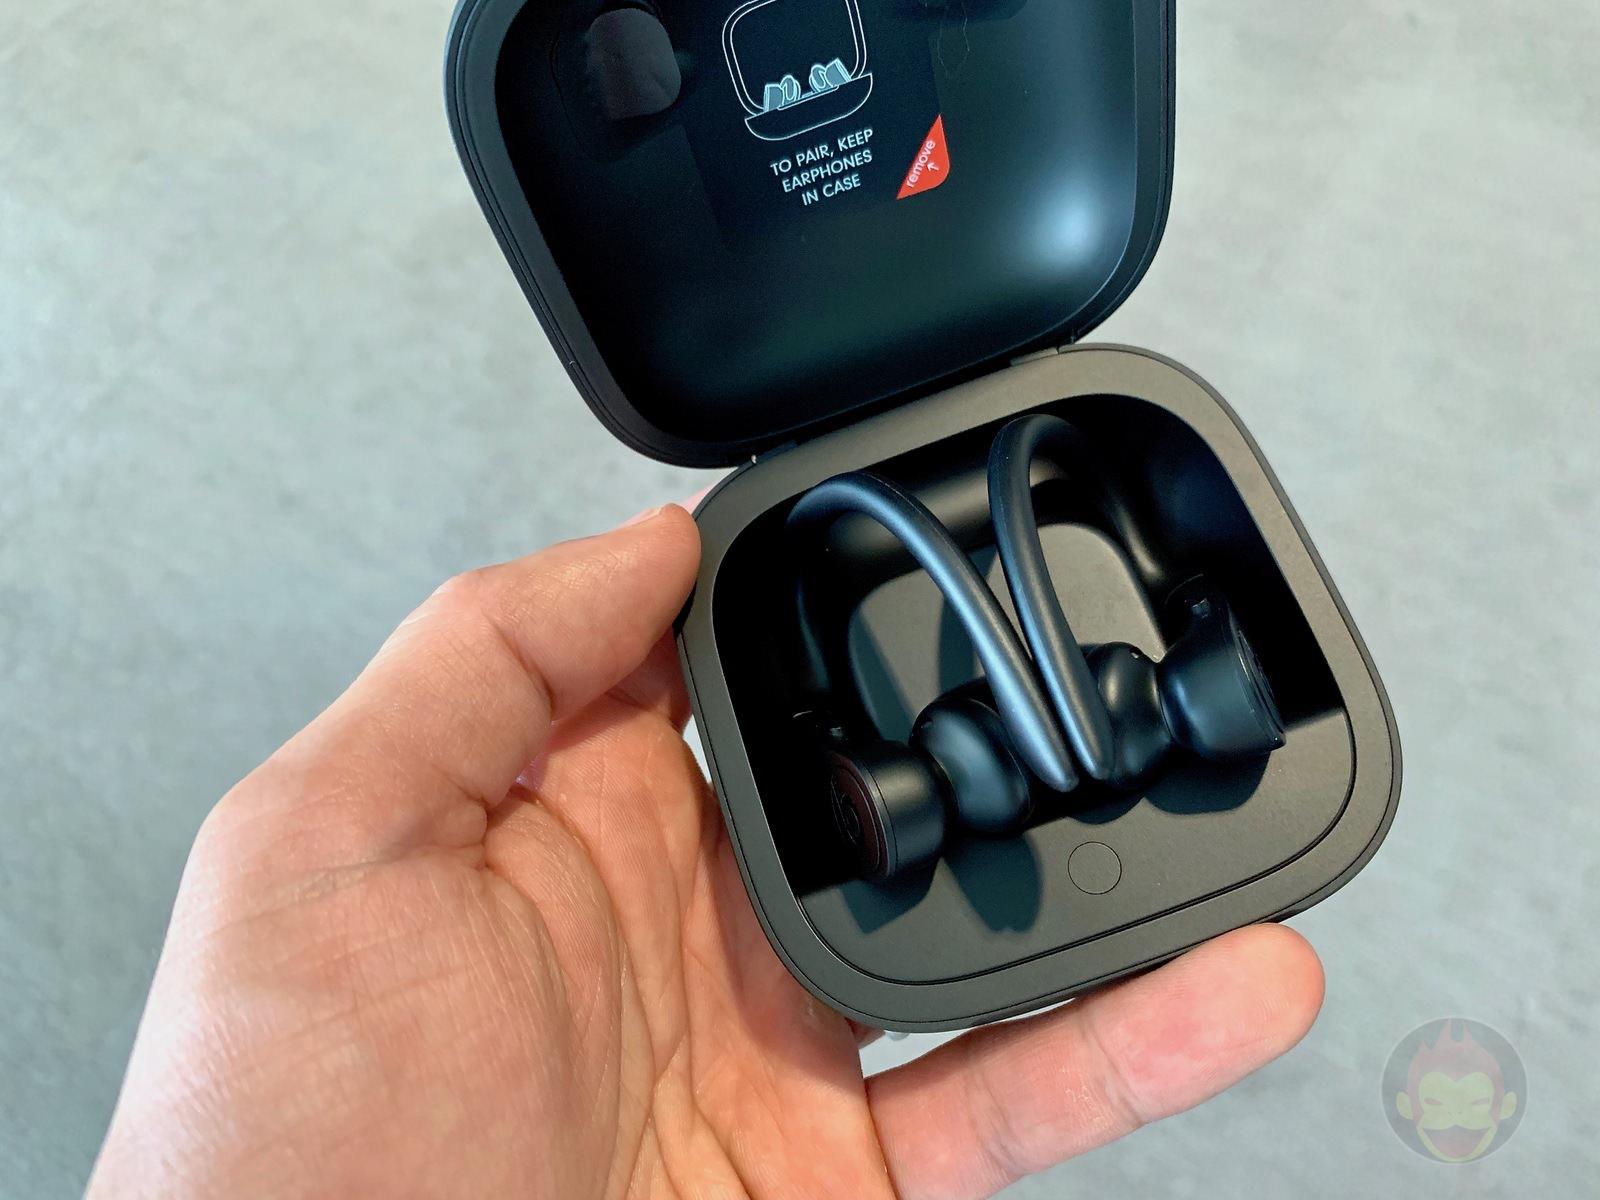 Beats-Powerbeats-pro-full-wireless-earphones-handson-04.jpg